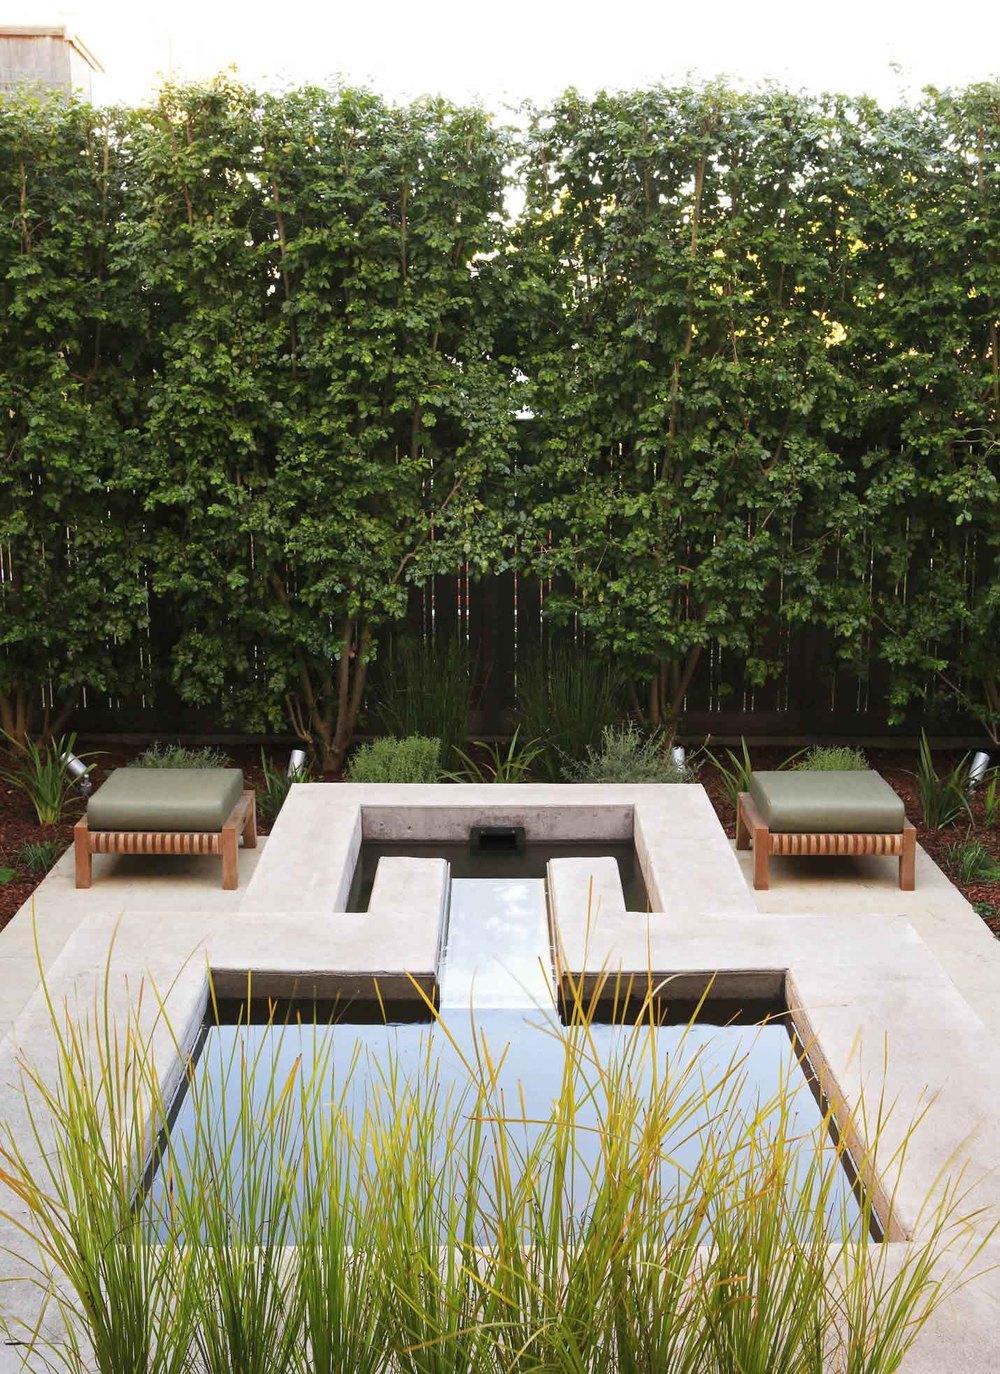 Garden Vignette by Arterra Landscape Architects Photo by Michele Lee Willson